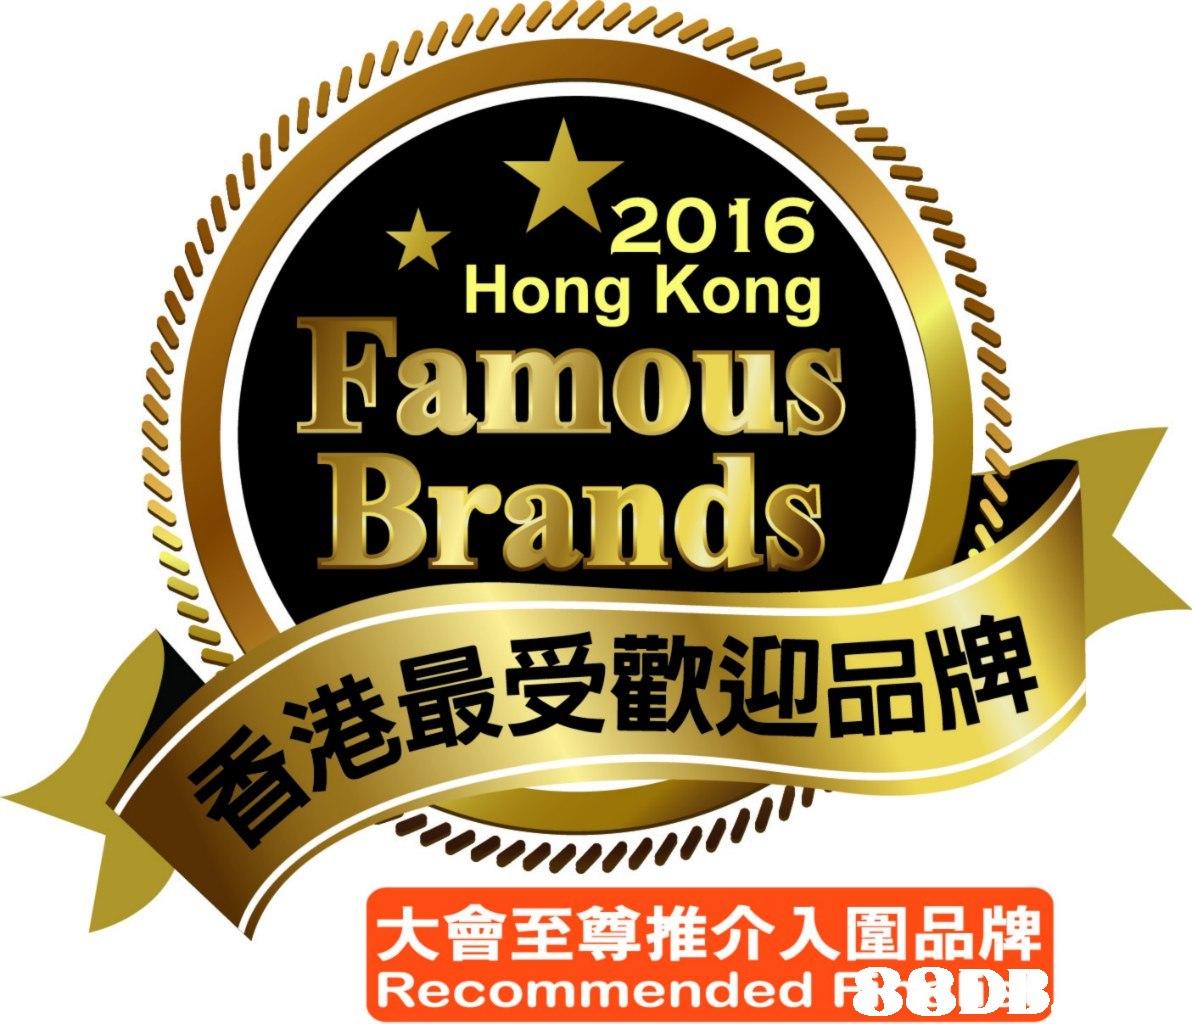 2016 Hong Kong Famous Brands 港最受歡迎品牌 大會至尊推介入圍品牌 Recommended F8DB,text,font,logo,product,brand